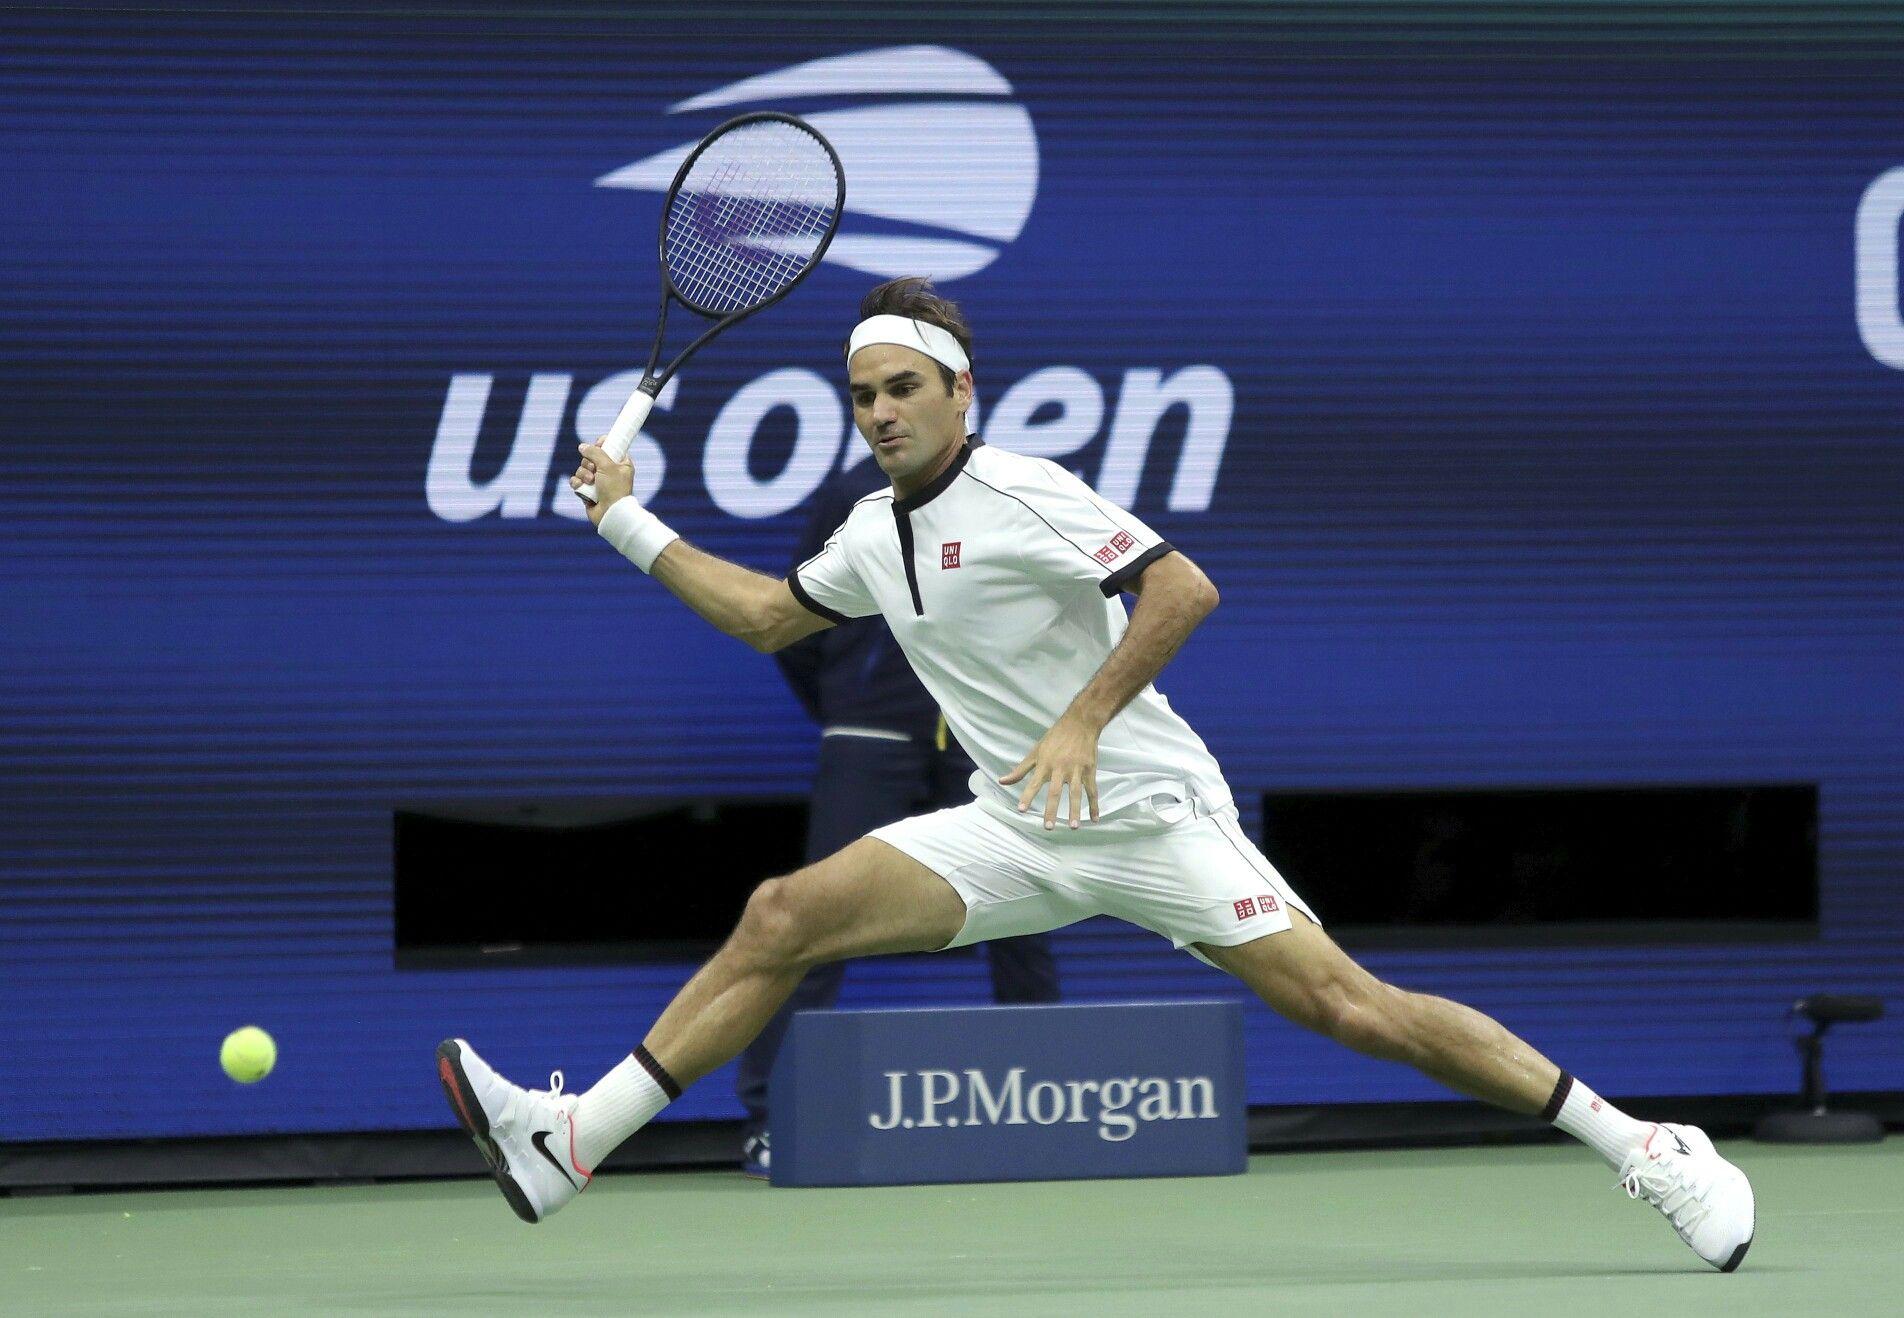 Pin By Yuto Moronuki On Roger Federer Tennis Players Roger Federer Match Point